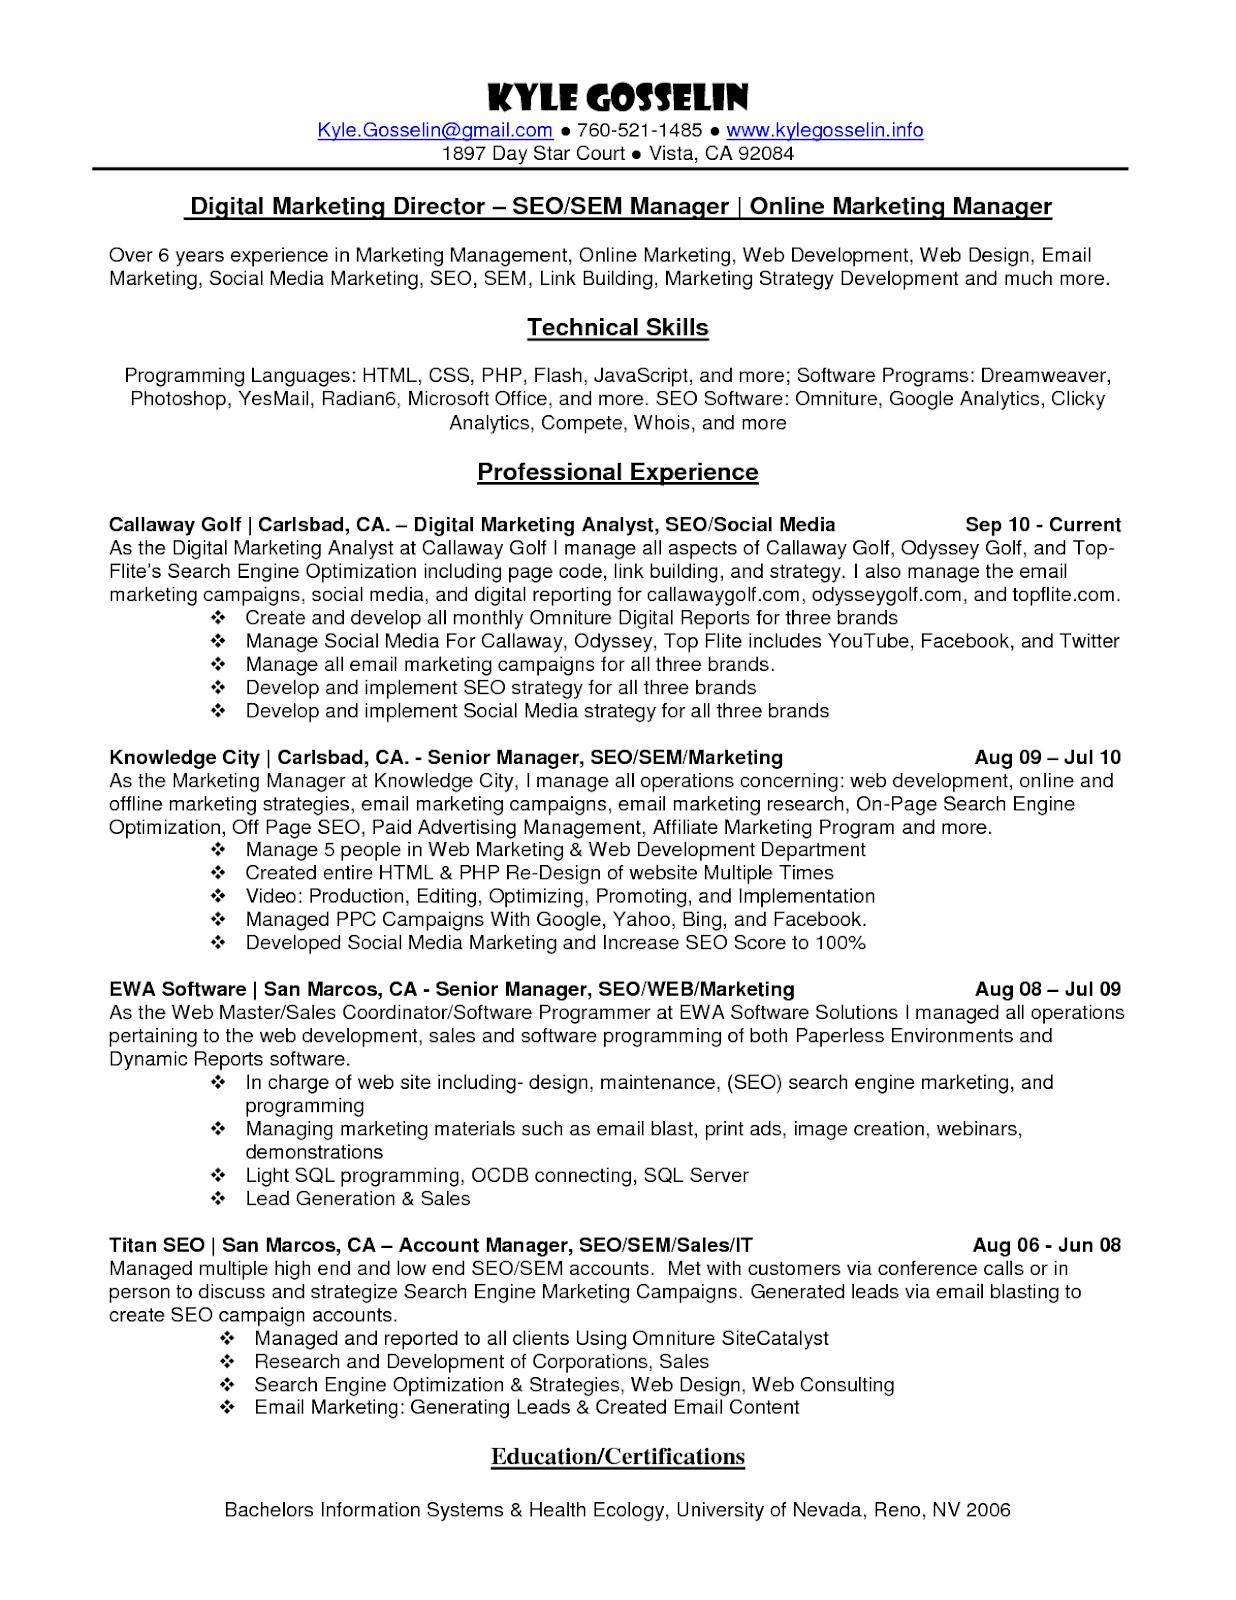 marketing resume examples, marketing resume examples 2019, marketing resume examples entry level, marketing resume examples, marketing manager resume examples, digital marketing resume examples, marketing intern resume examples, marketing resume summary examples, marketing resume examples 2020, marketing assistant resume examples